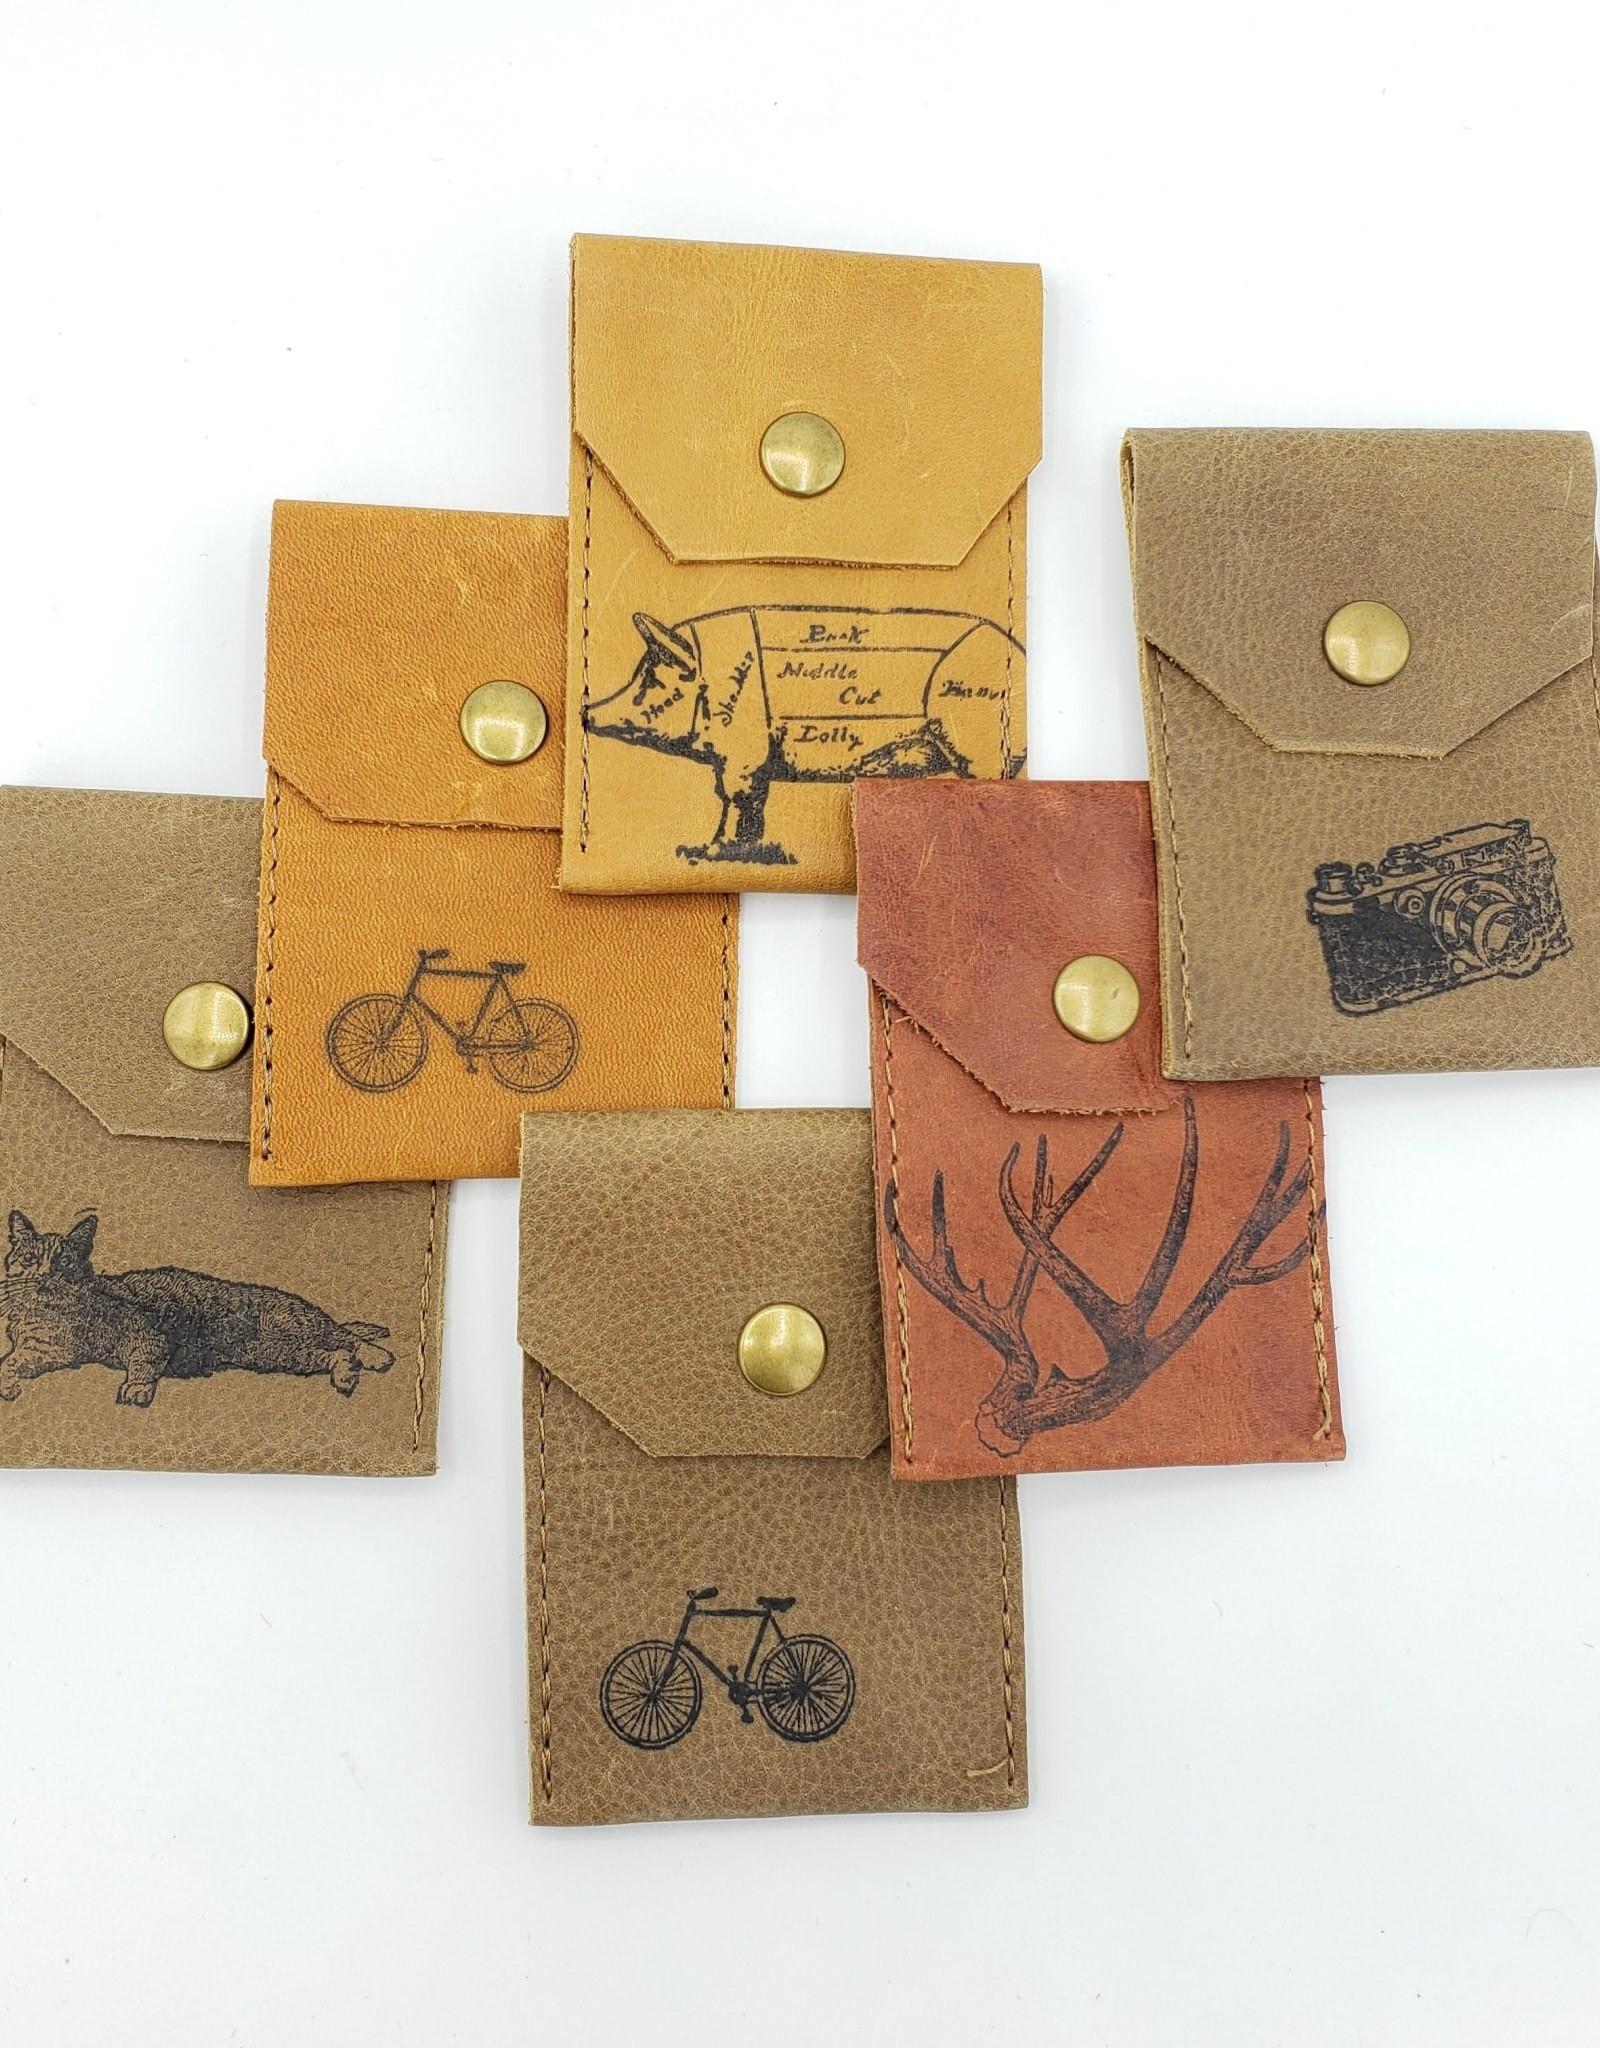 In Blue Handmade Antler - Leather Snap Card Wallet